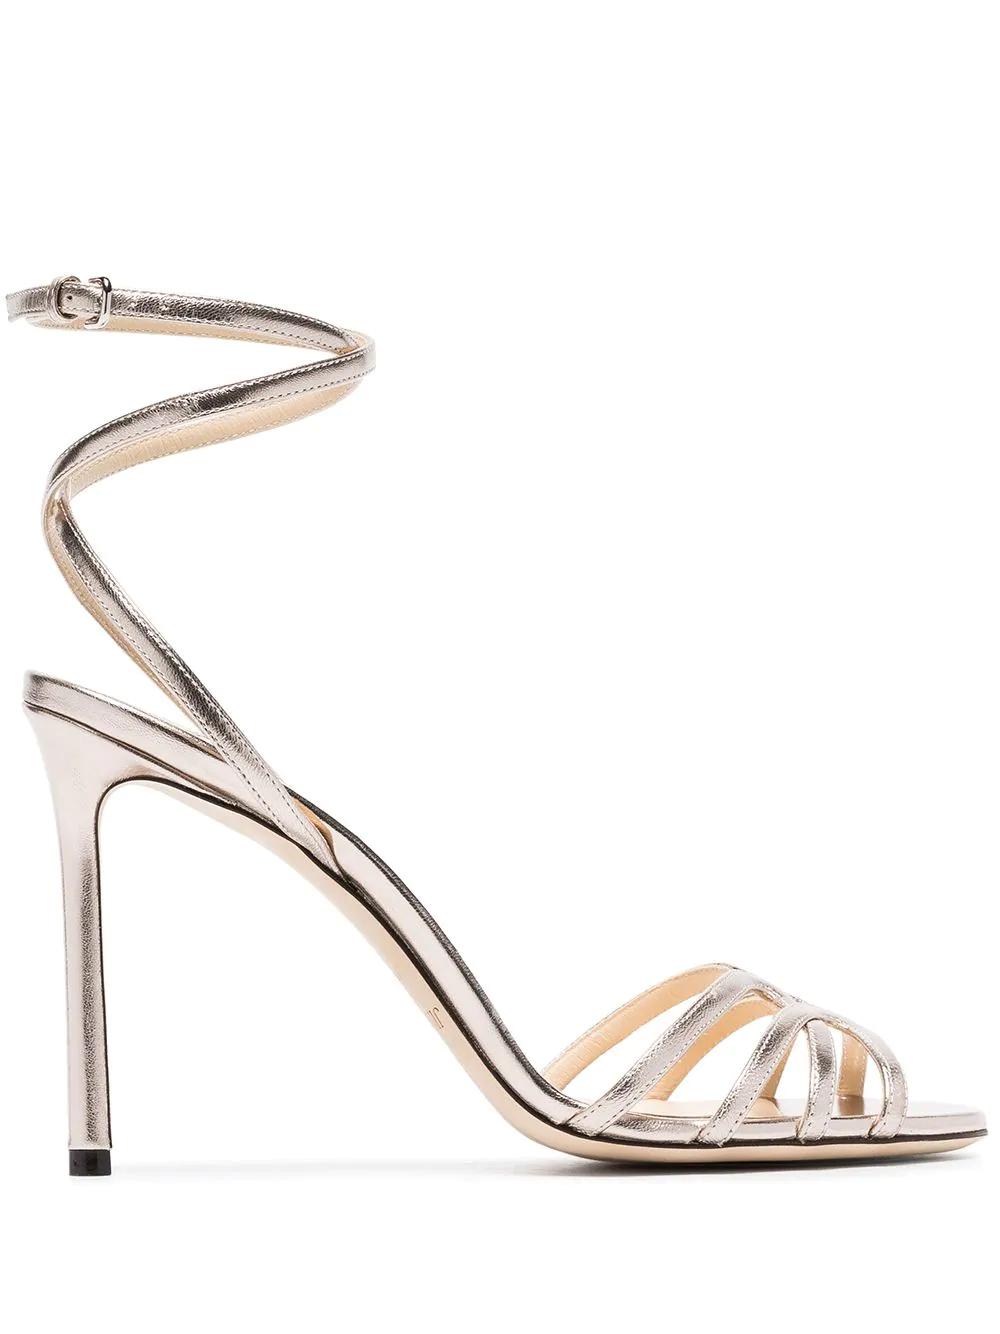 8d8a9252320 Jimmy Choo Mimi 100 Bronze Leather Sandals In Metallic